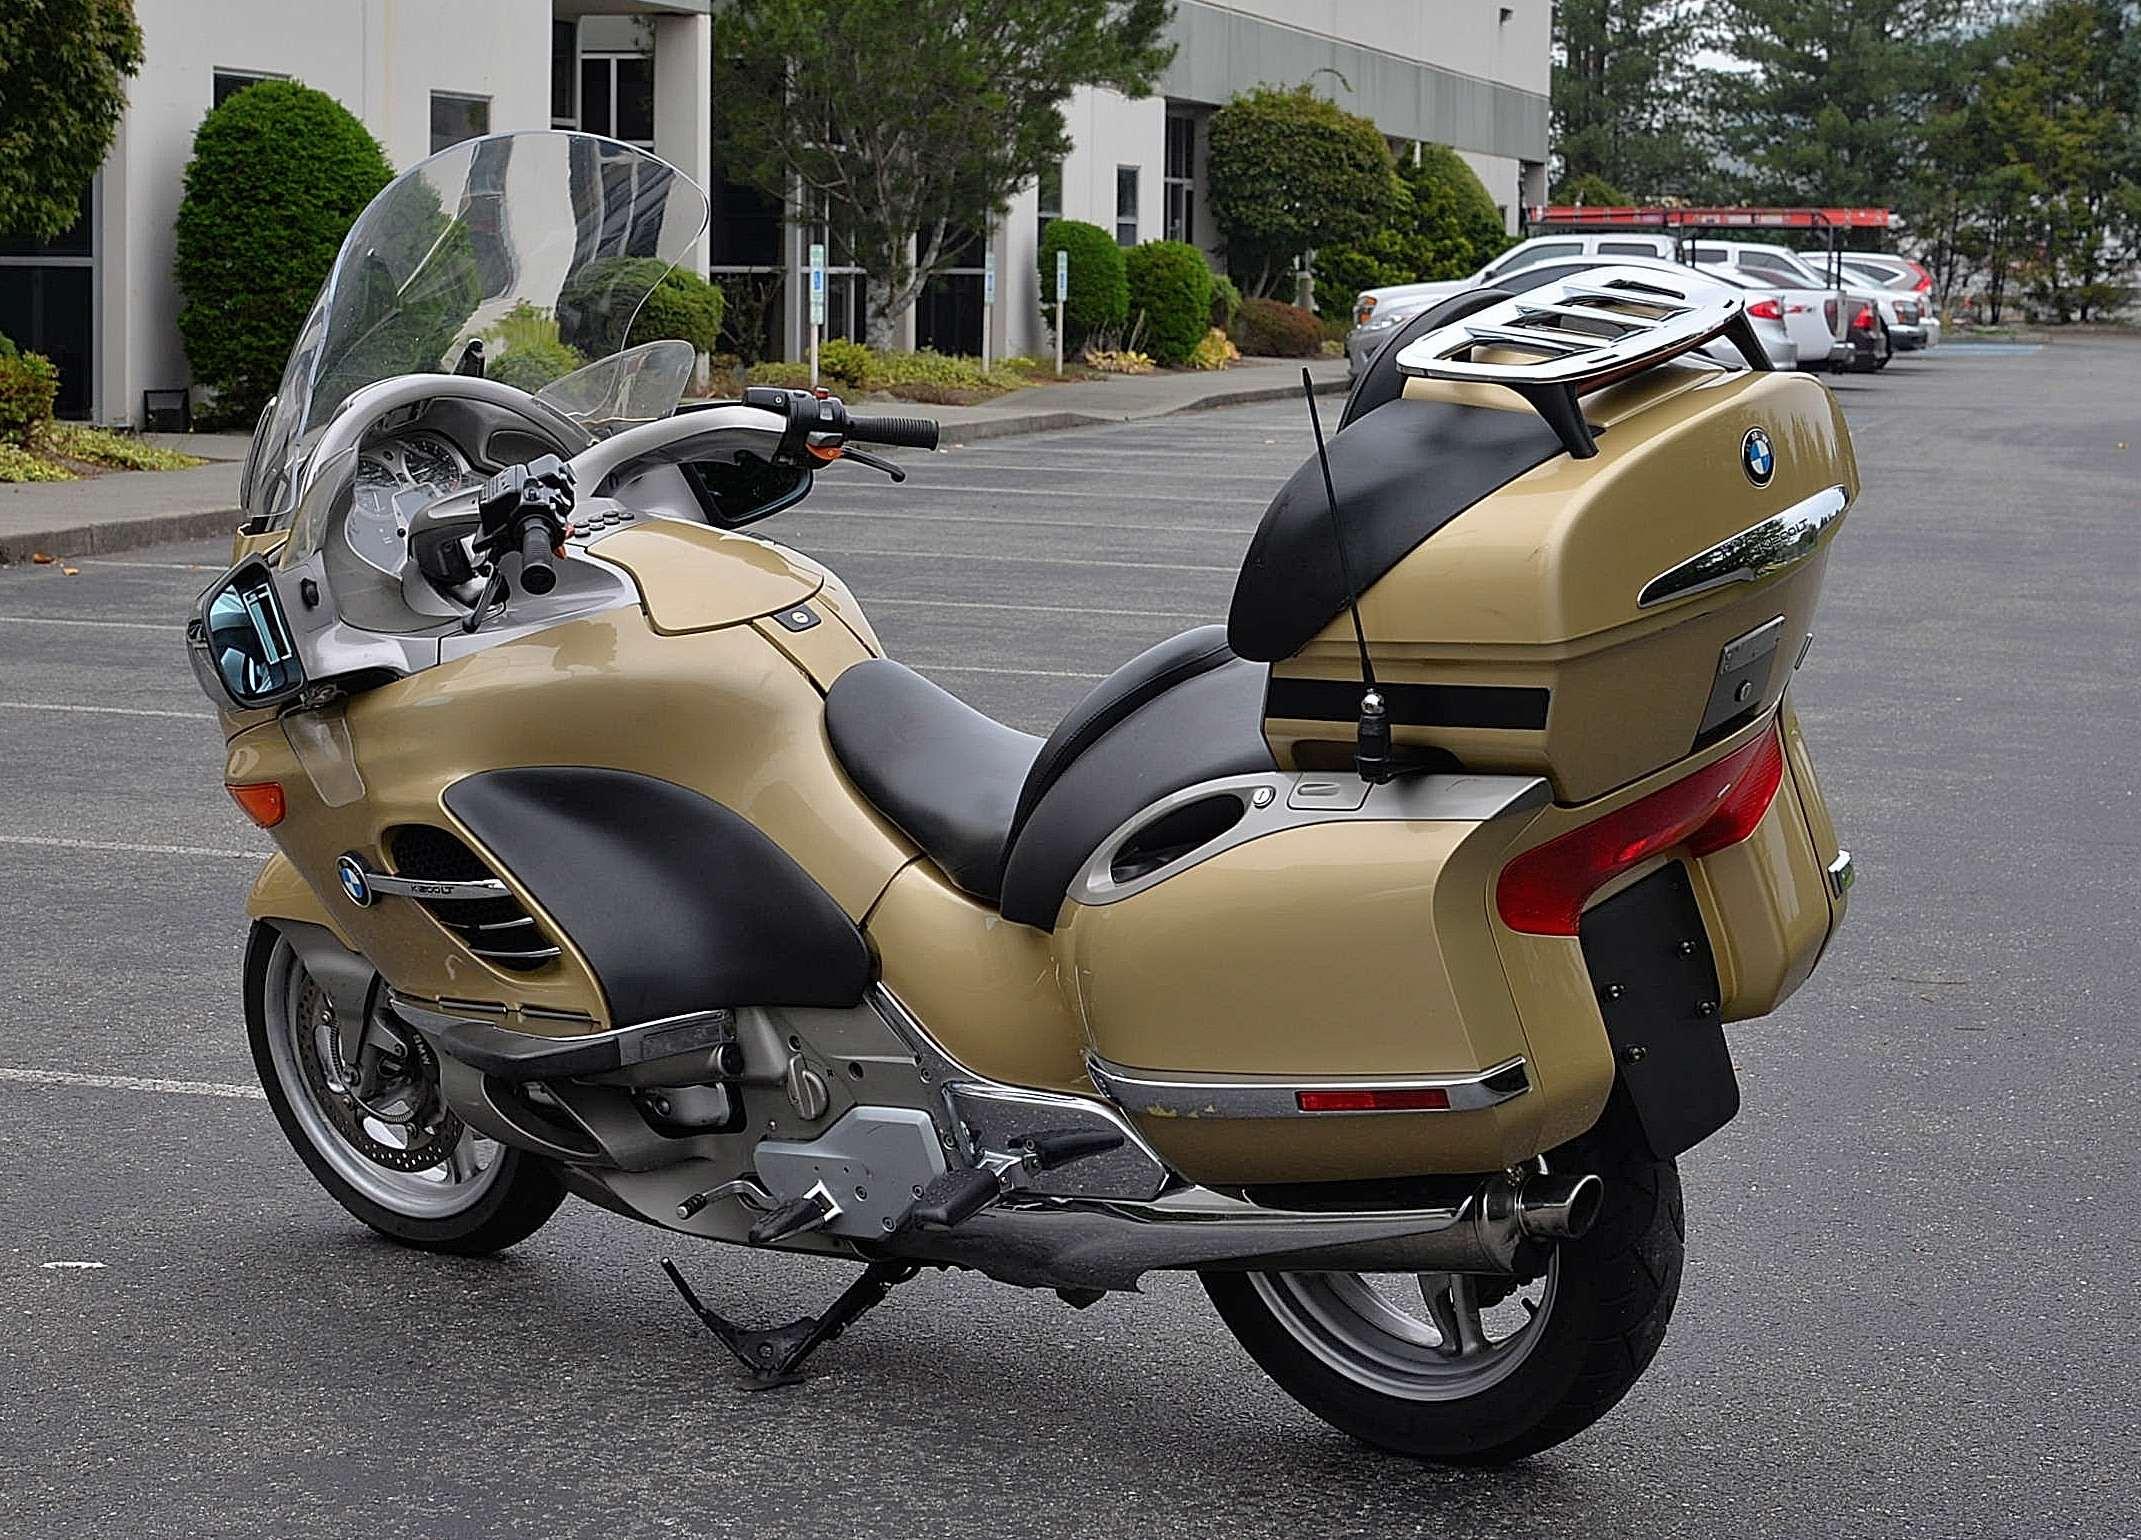 1999 BMW K 1200 LT Touring Motorcycle From Pensacola, FL